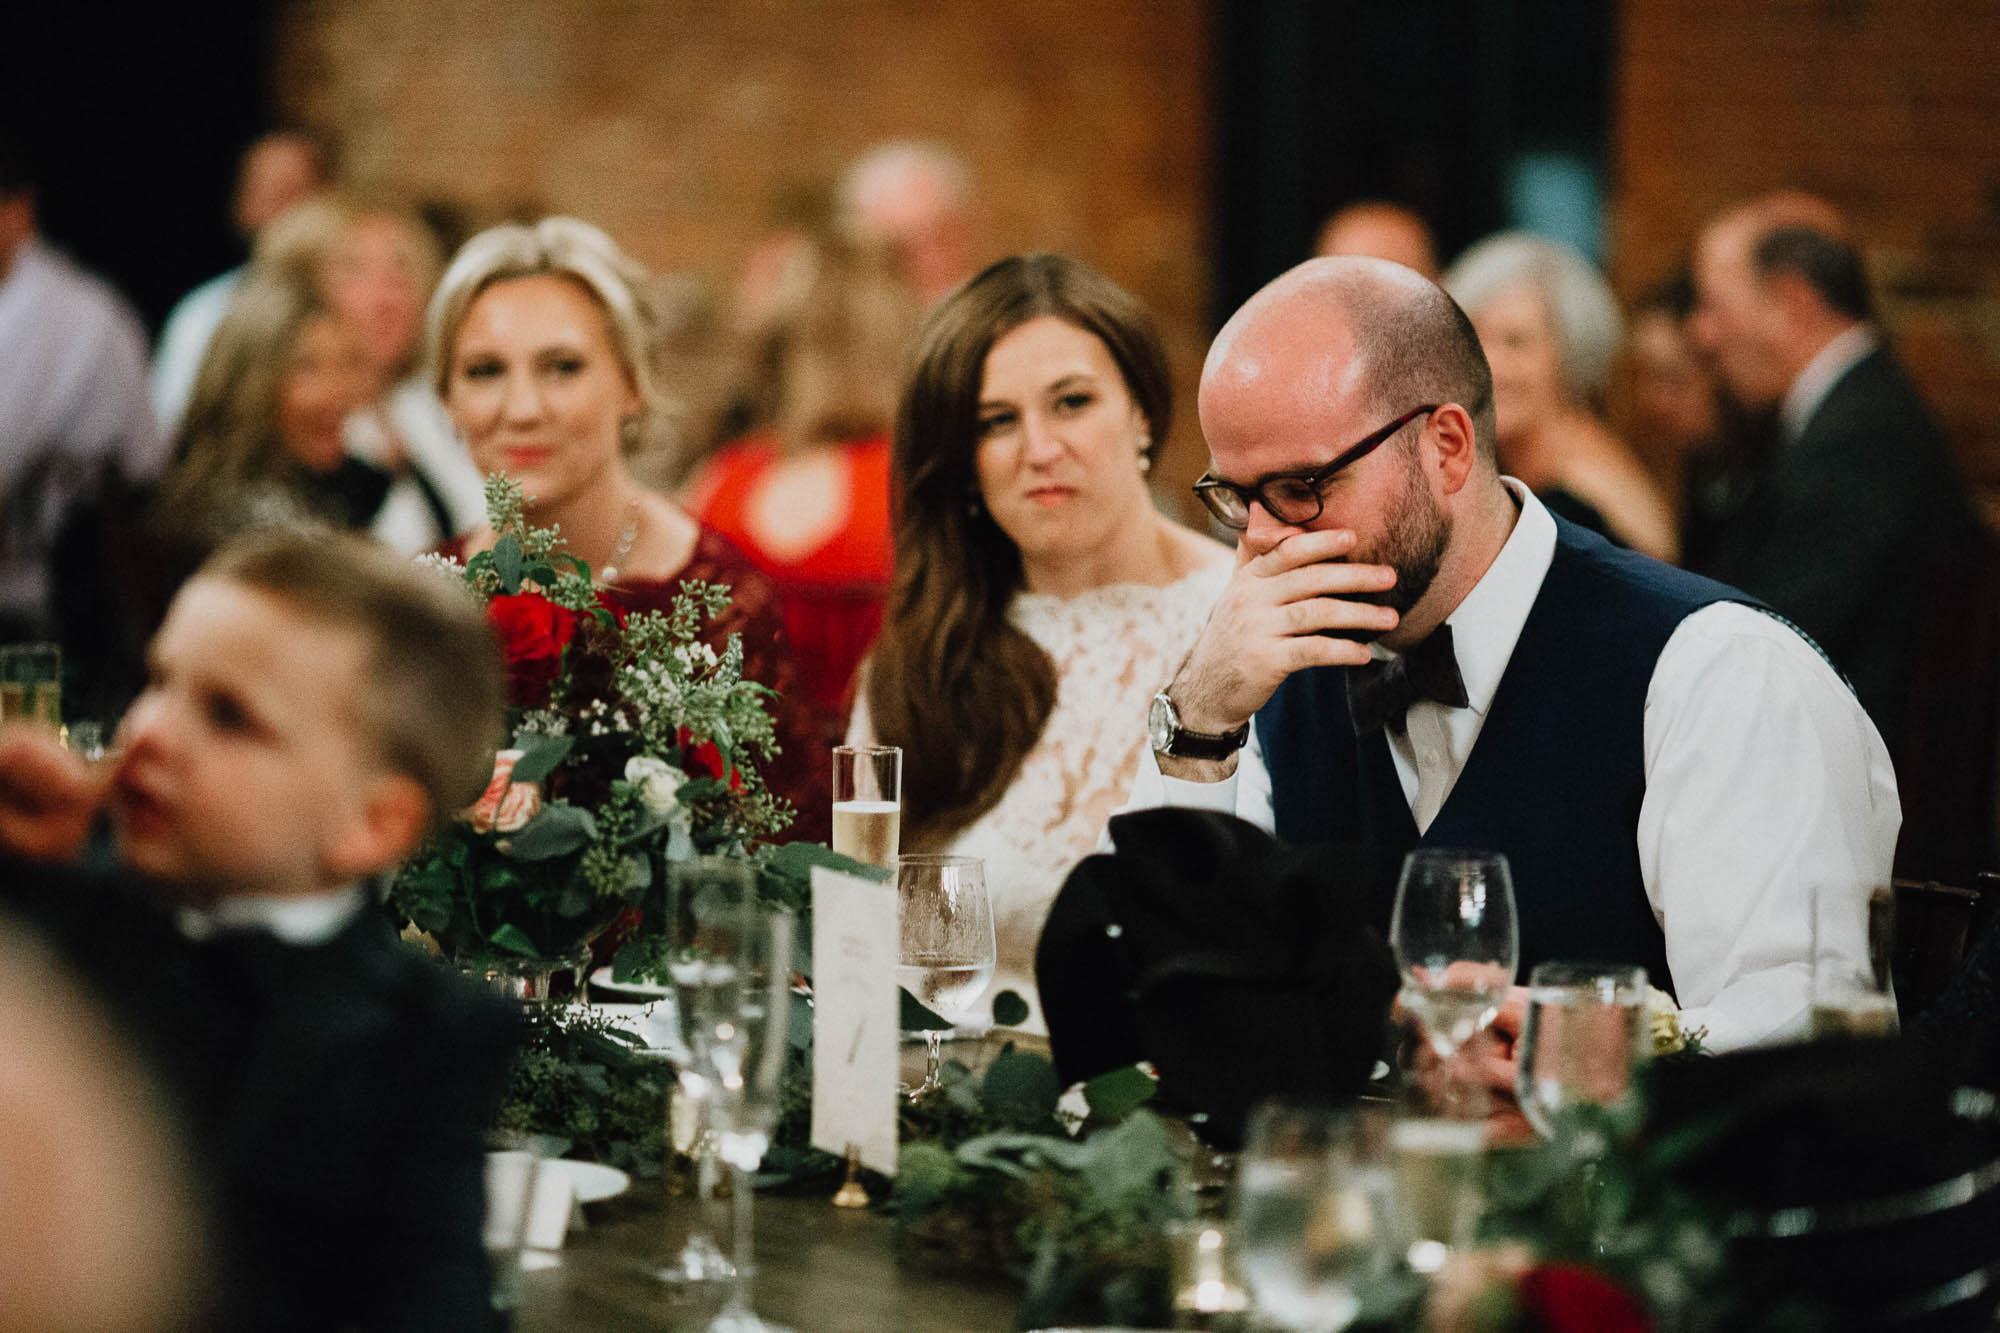 Highline-Car-House-Wedding-Columbus-Kristin-Aaron-107.jpg